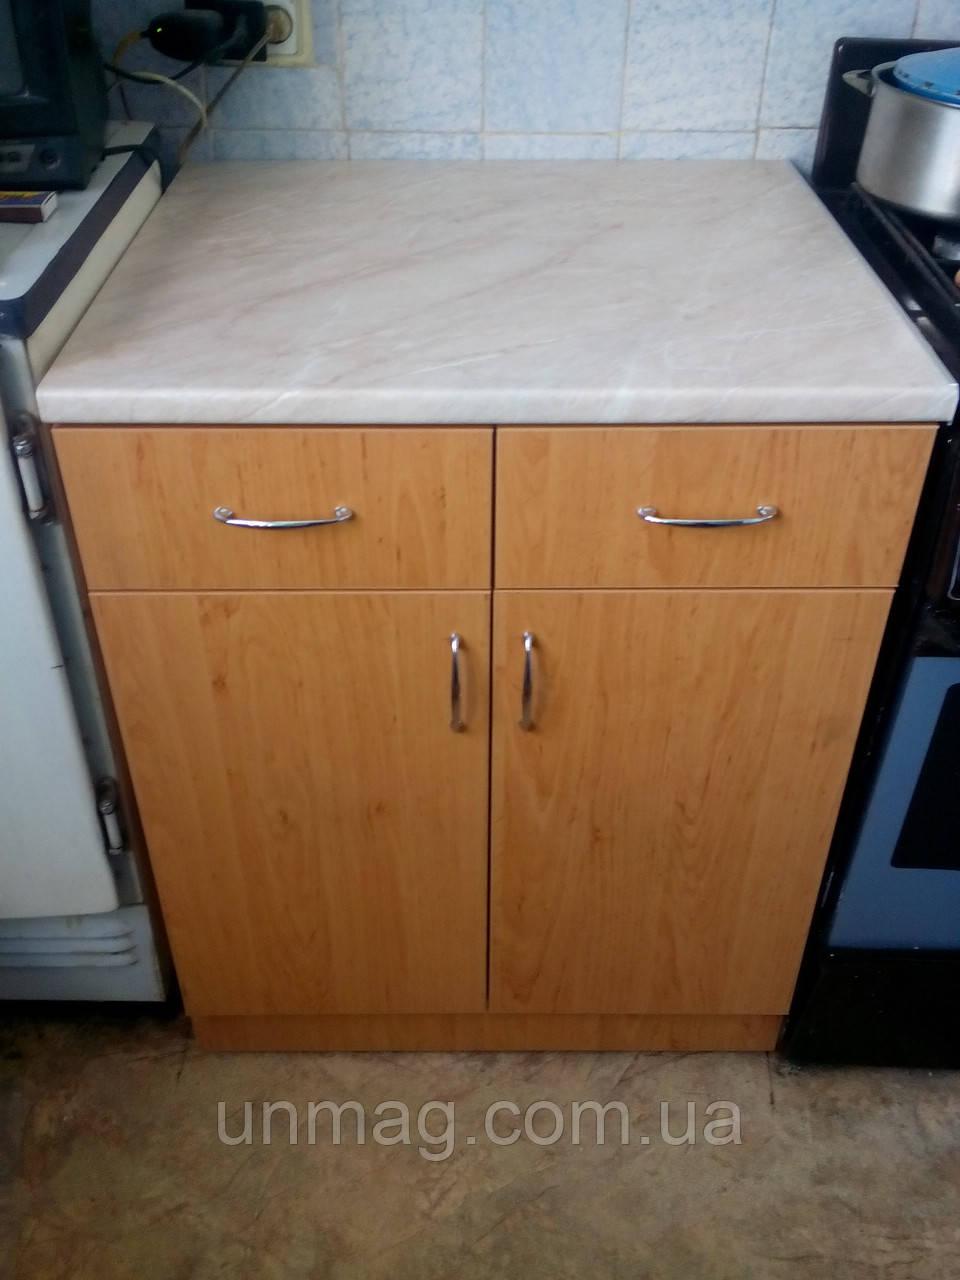 Купить тумбочку для кухни кухонный гарнитур эмфа